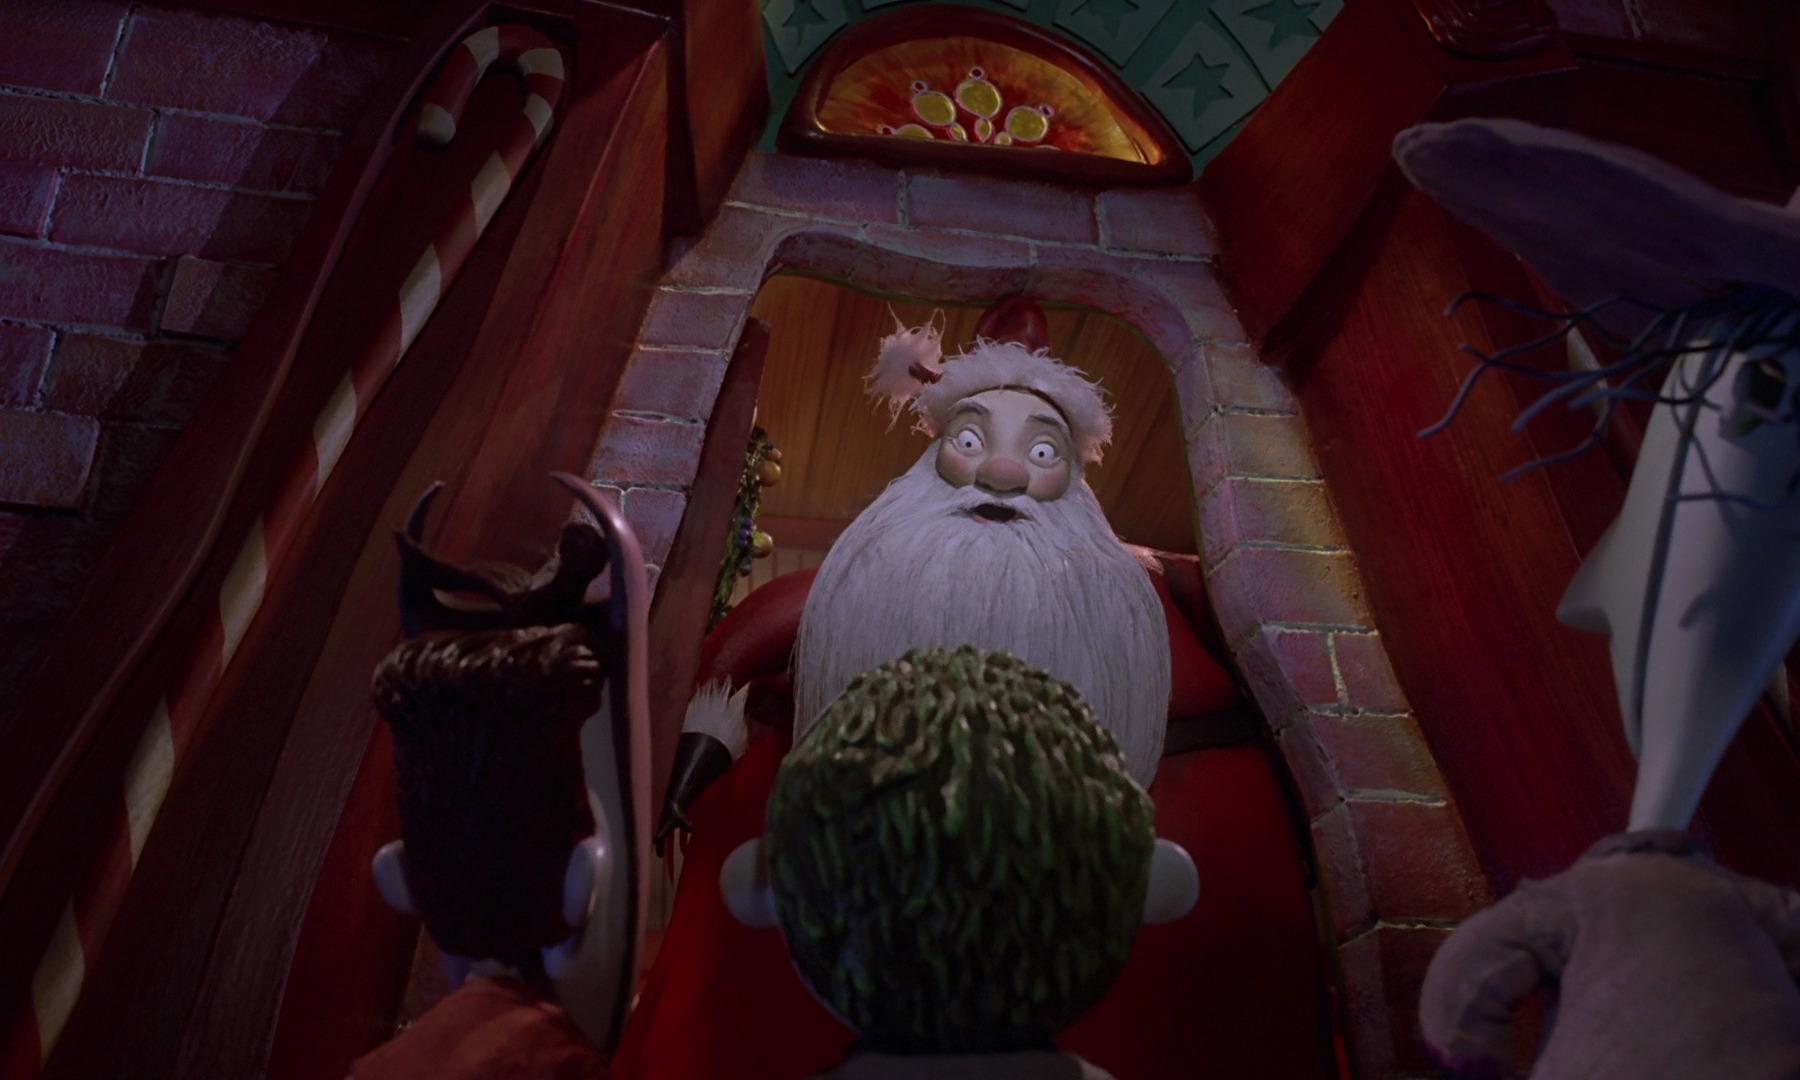 Santa Claus (The Nightmare Before Christmas)/Gallery